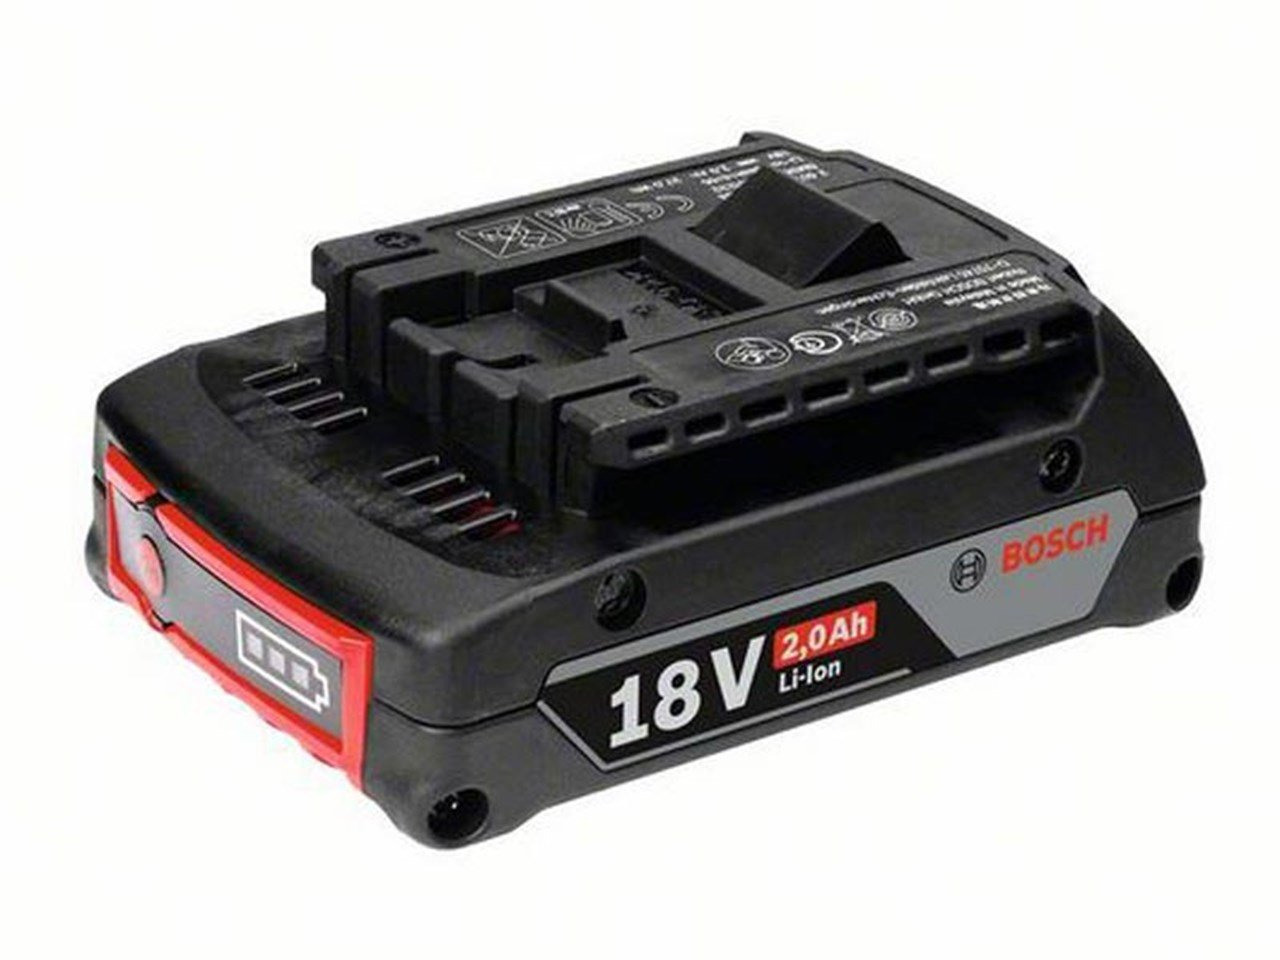 Akumuliatorius BOSCH GBA 18V 2.0Ah, akumuliatoriaus įtampa 18 V, akumuliatoriaus talpa 2 Ah